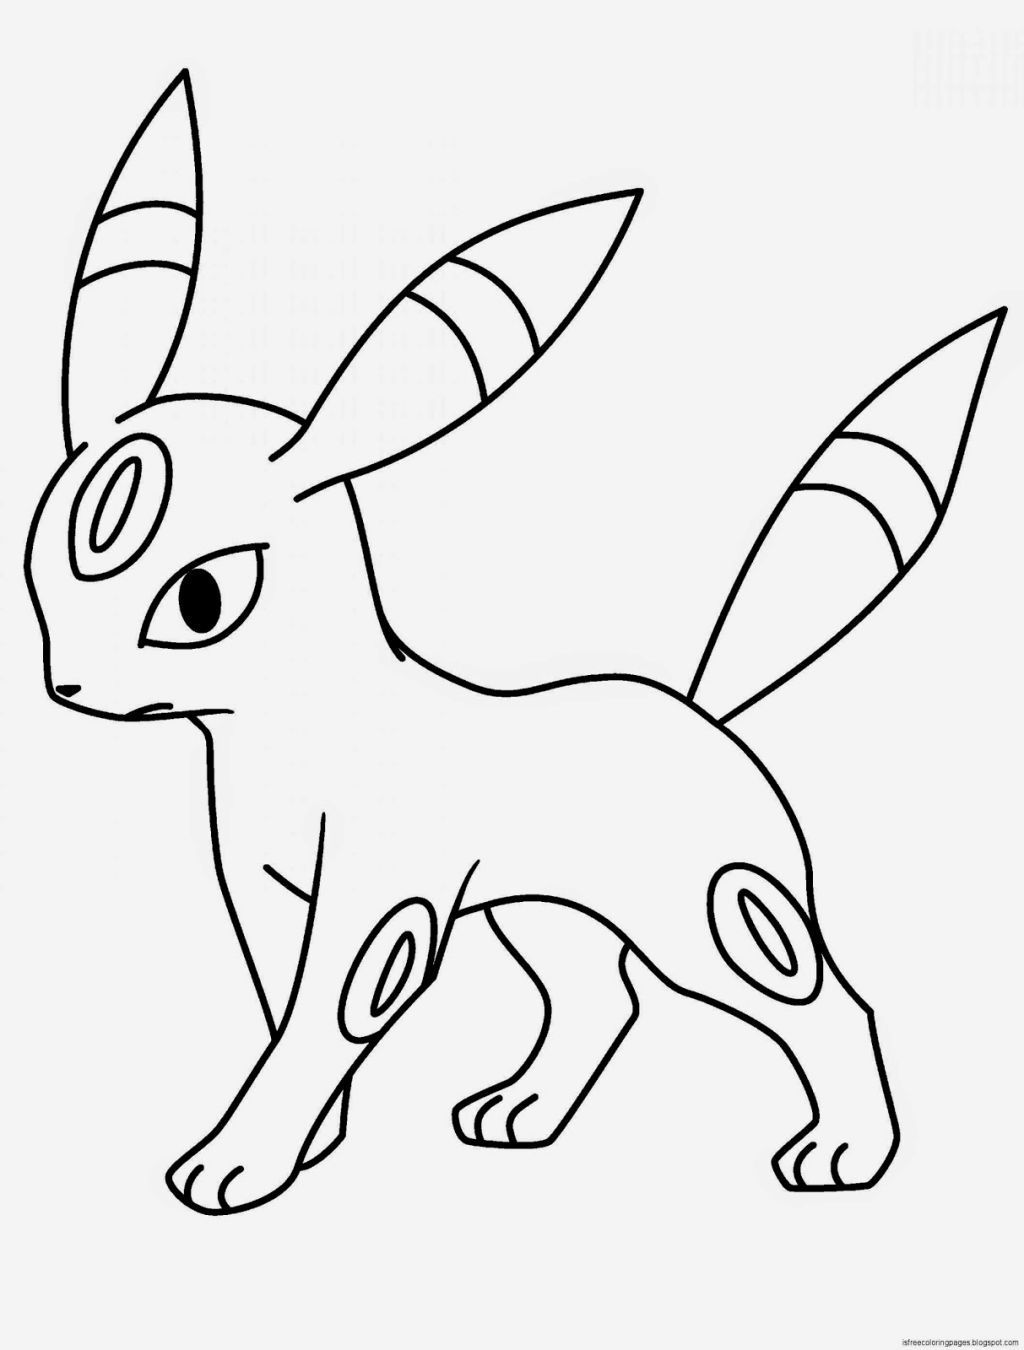 Uncategorized Pokémon Drawings coloring pages pinterest explore pokemon kids colouring and more